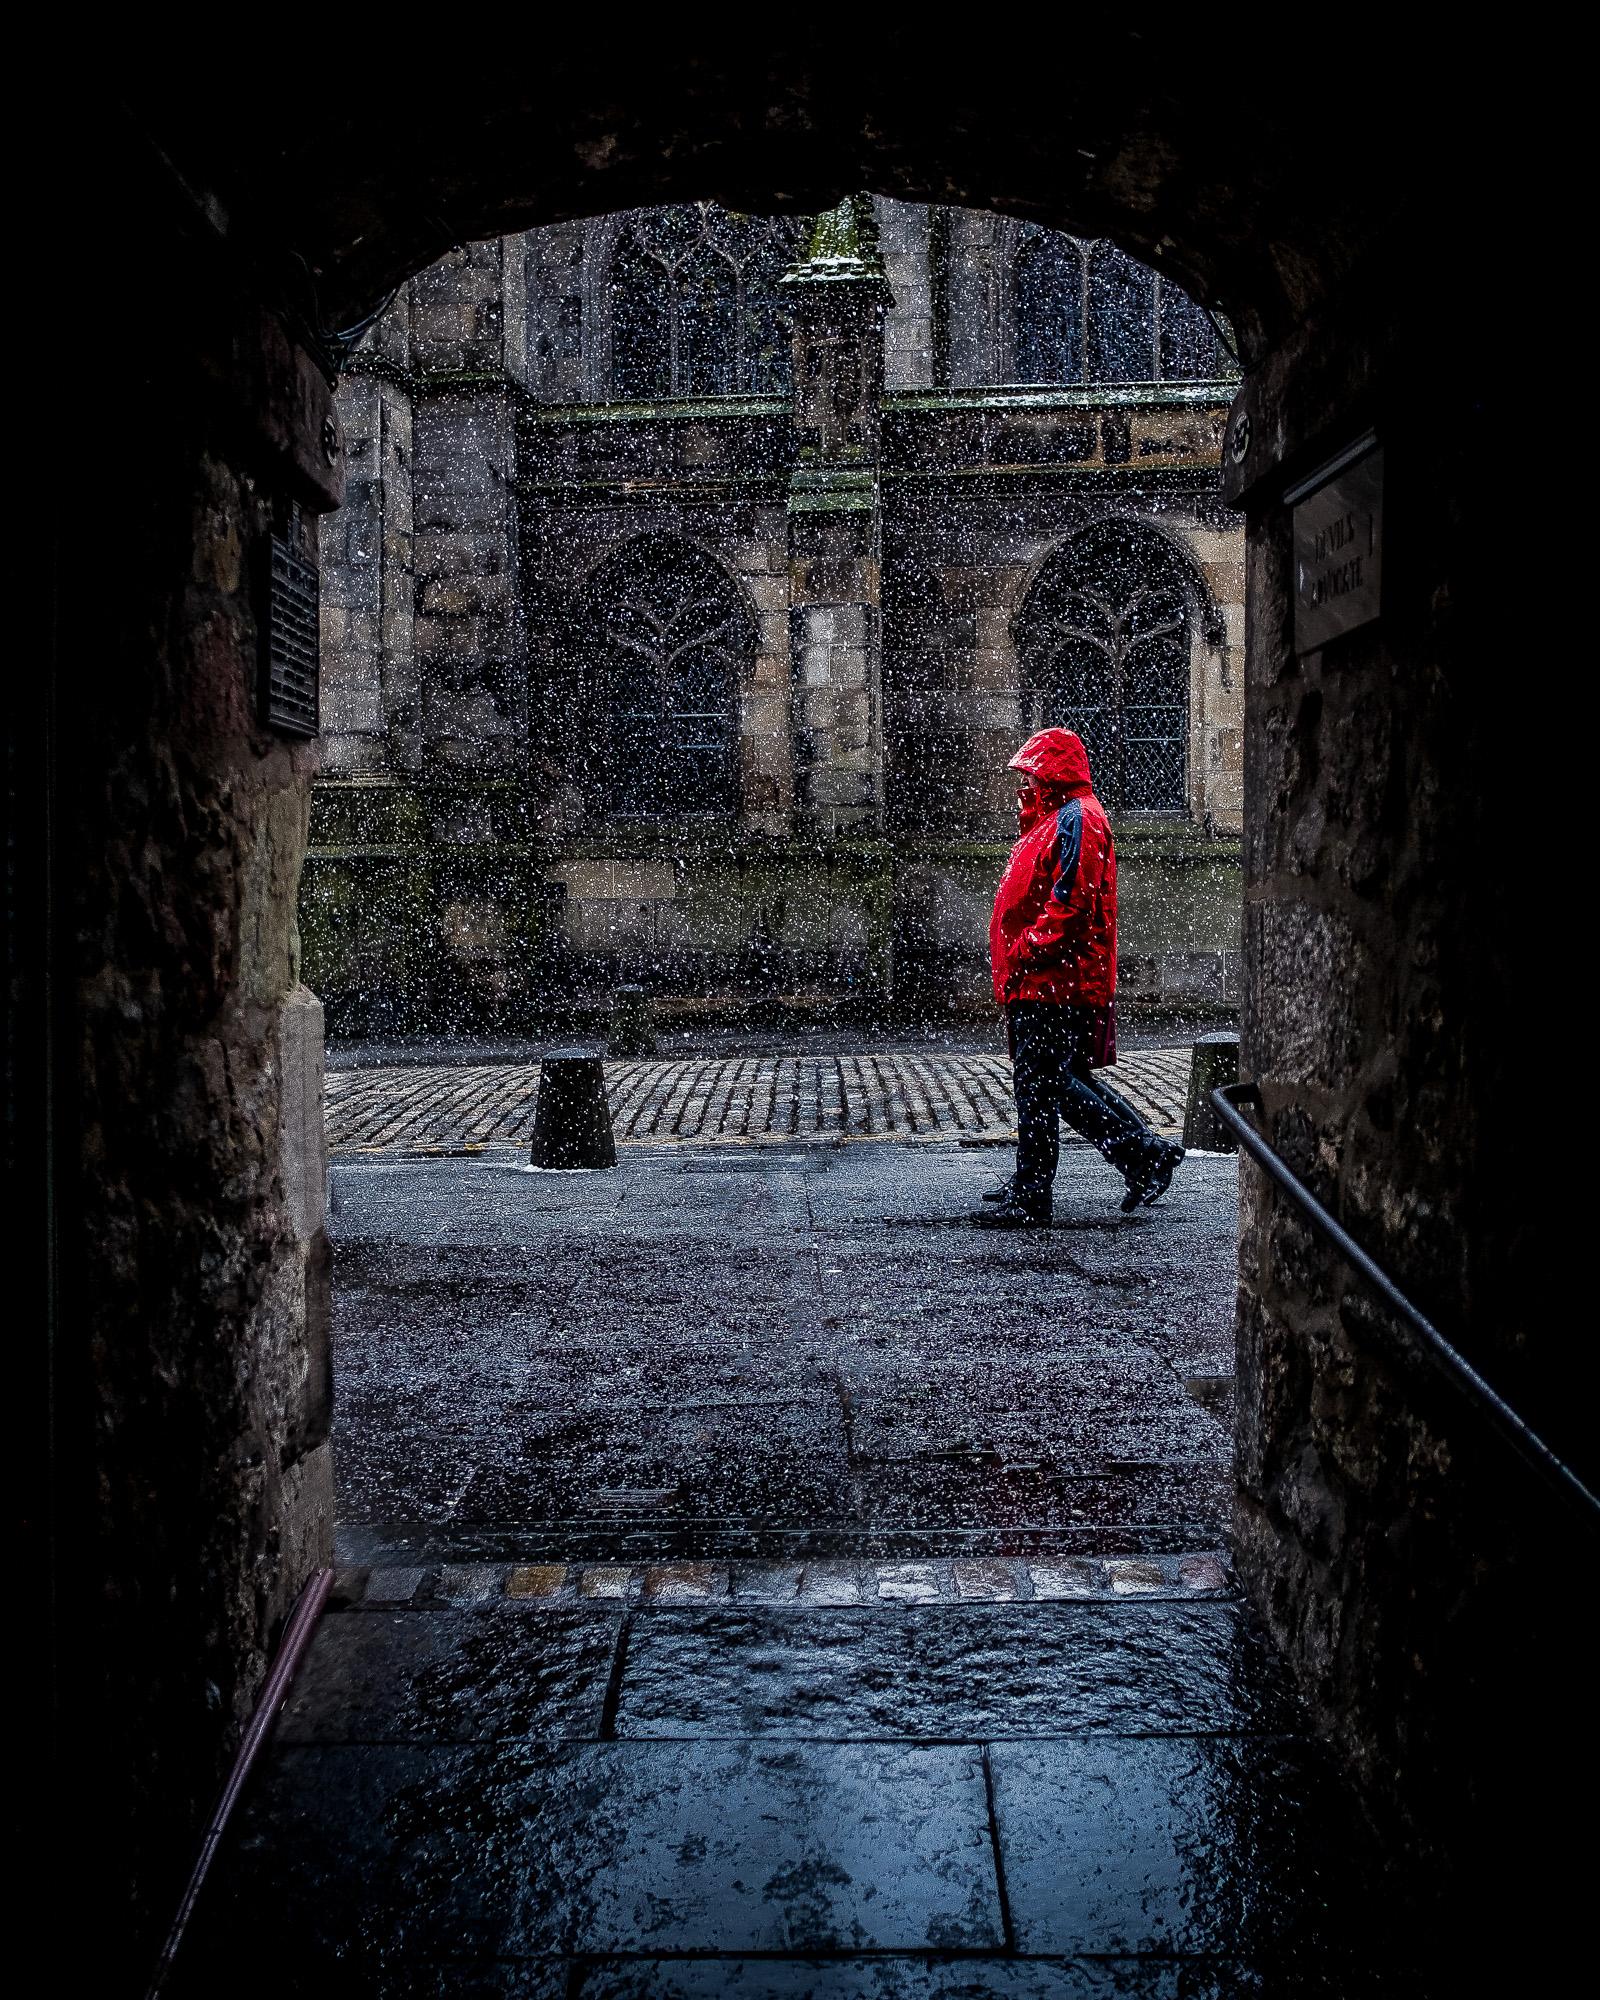 180121_Edinburgh in the Snow - Vlog_039-Edit-Edit.jpg